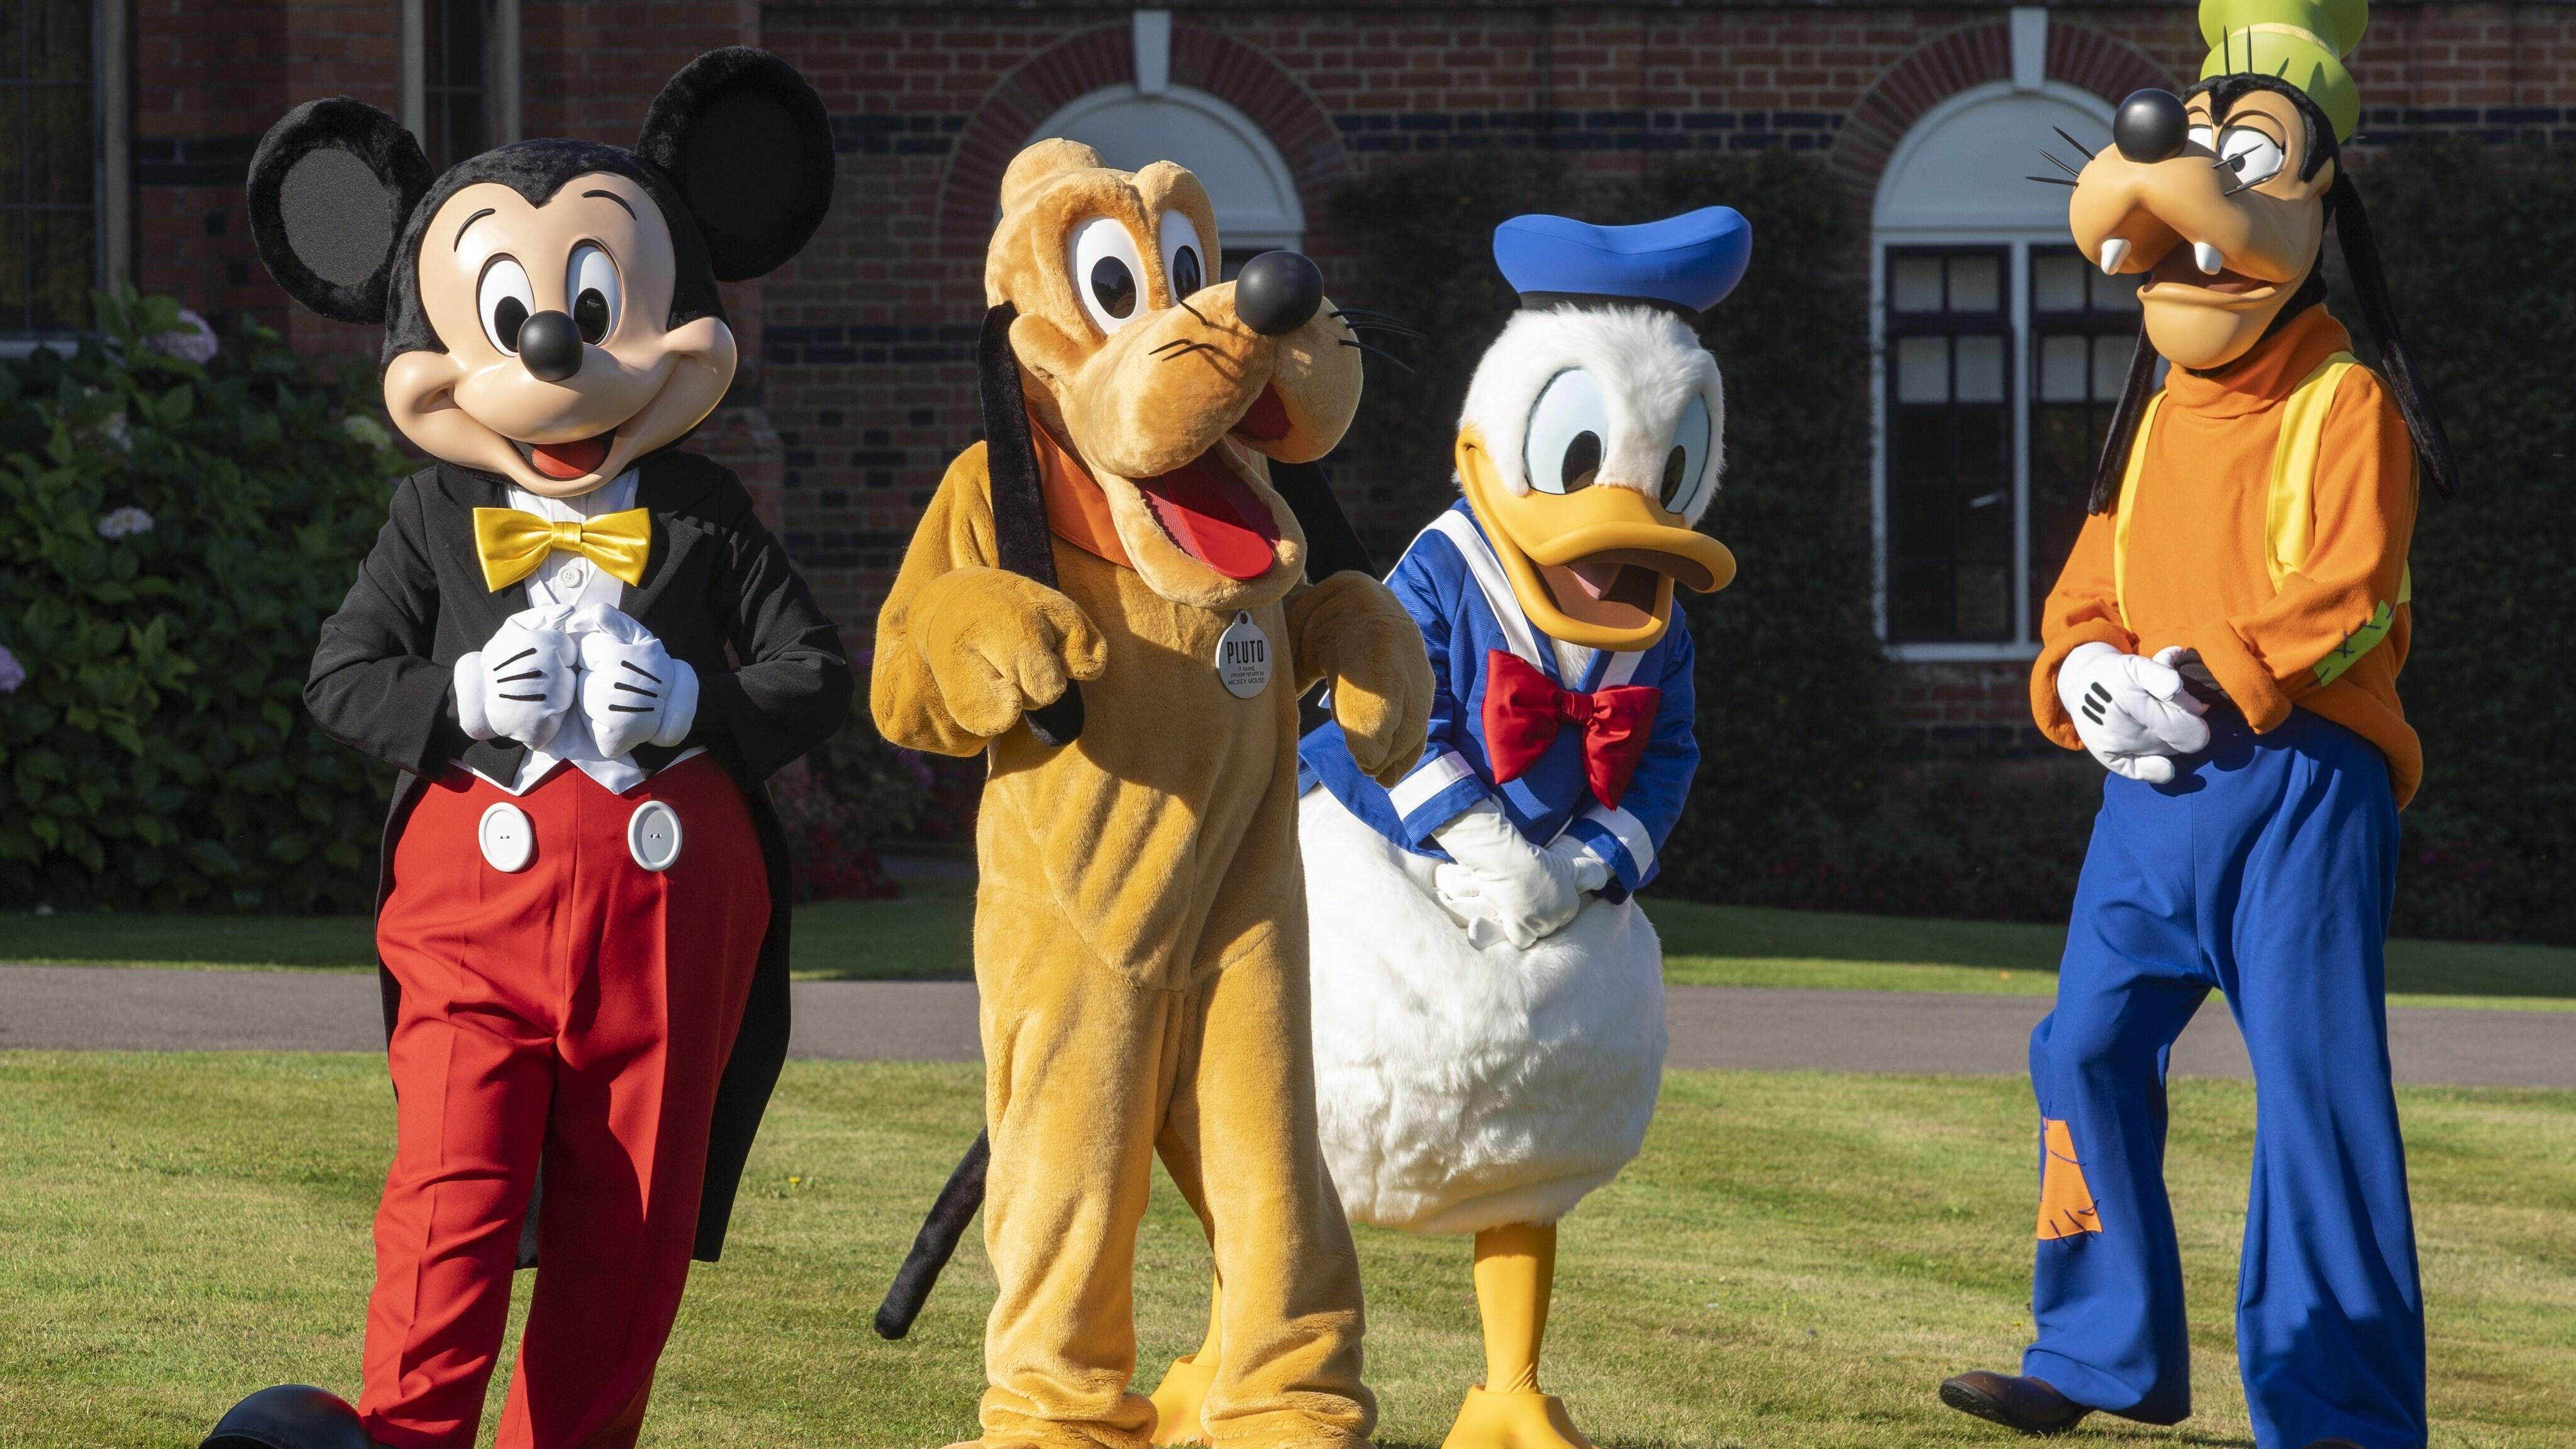 Mickey Mouse, Pluto, Donald Duck, Goofy